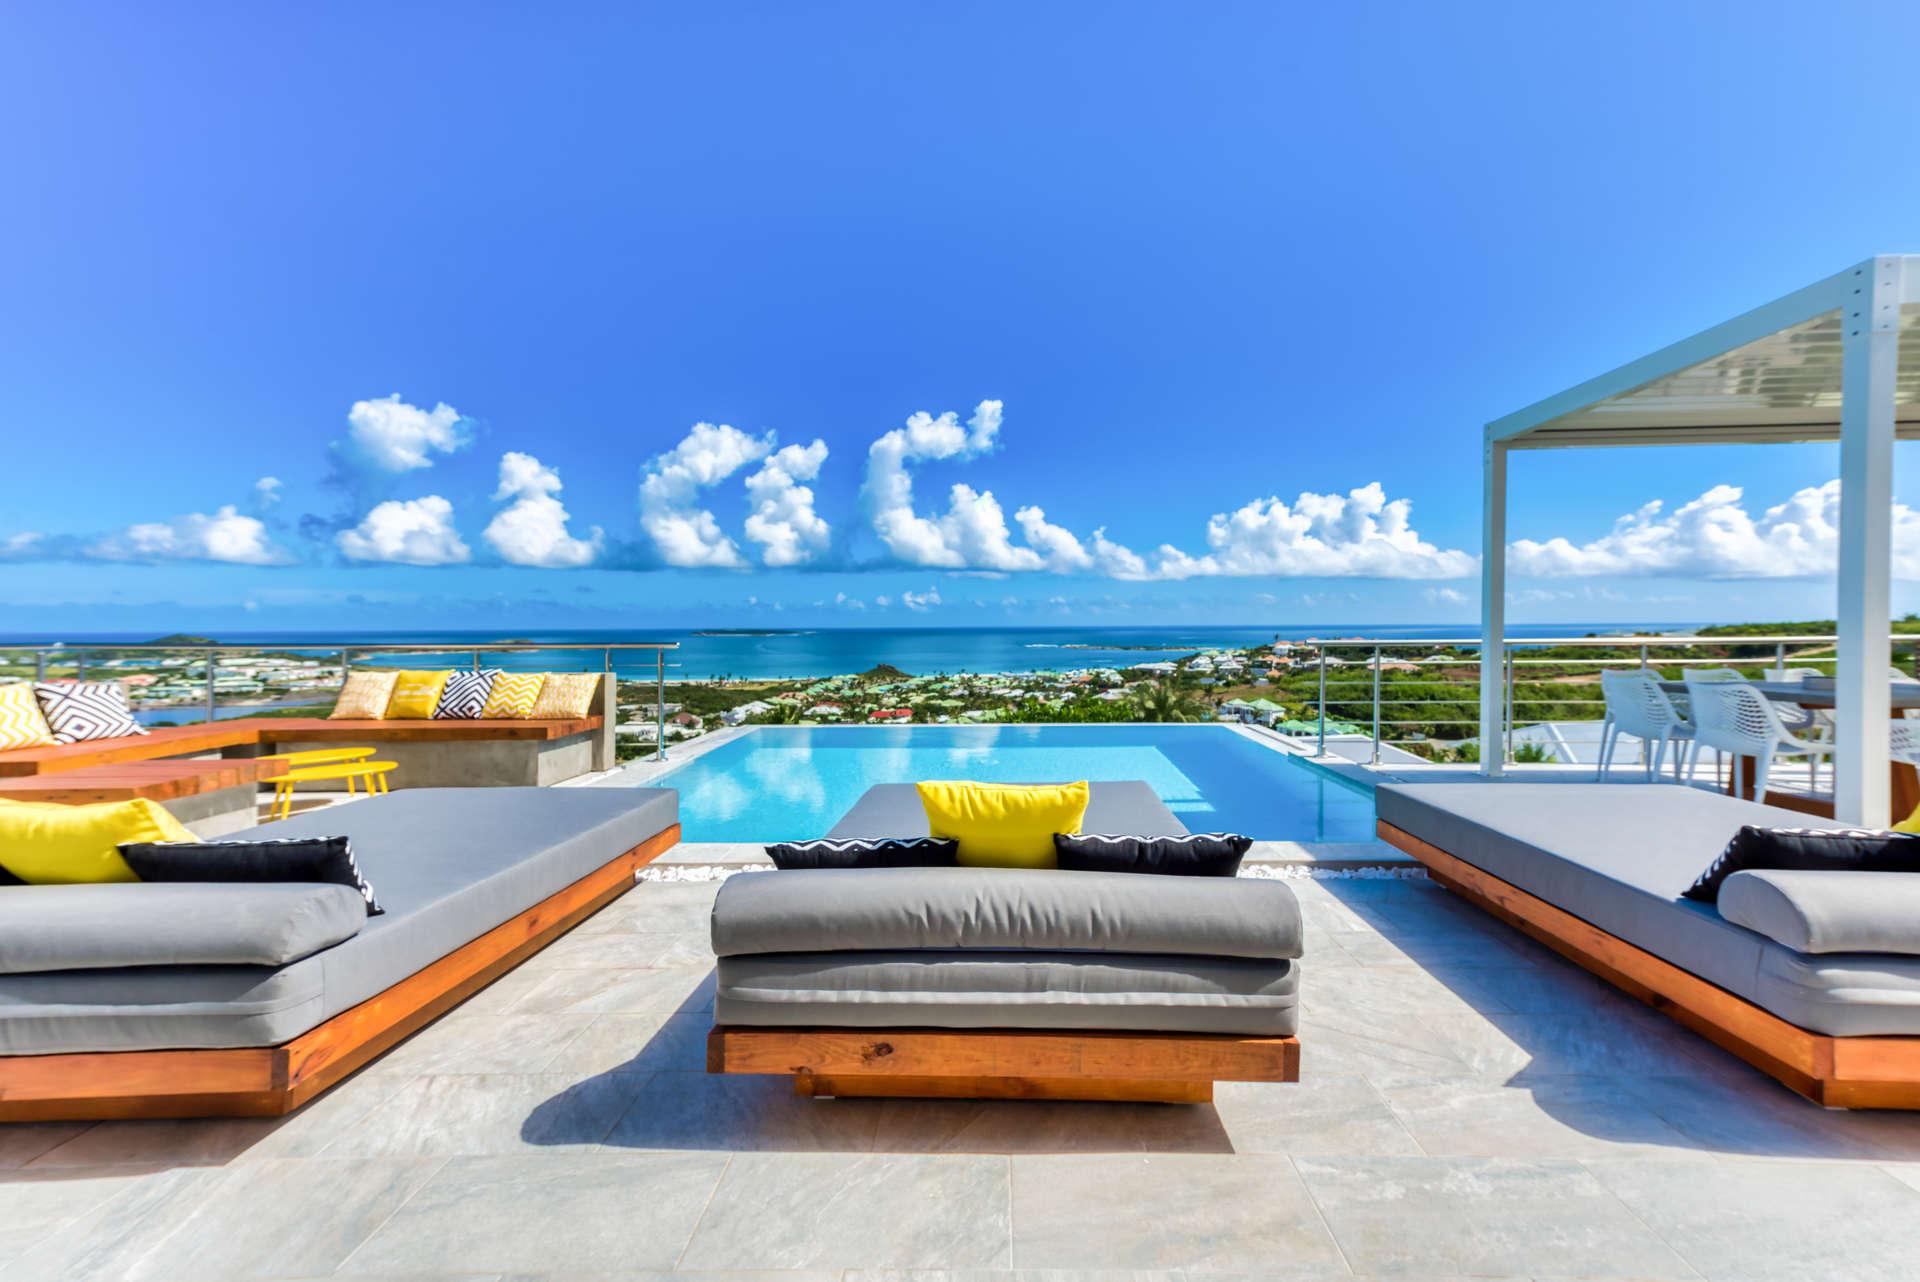 Luxury villa rentals caribbean - St martin - Saint martin french - Orient bay - Topaze - Image 1/19